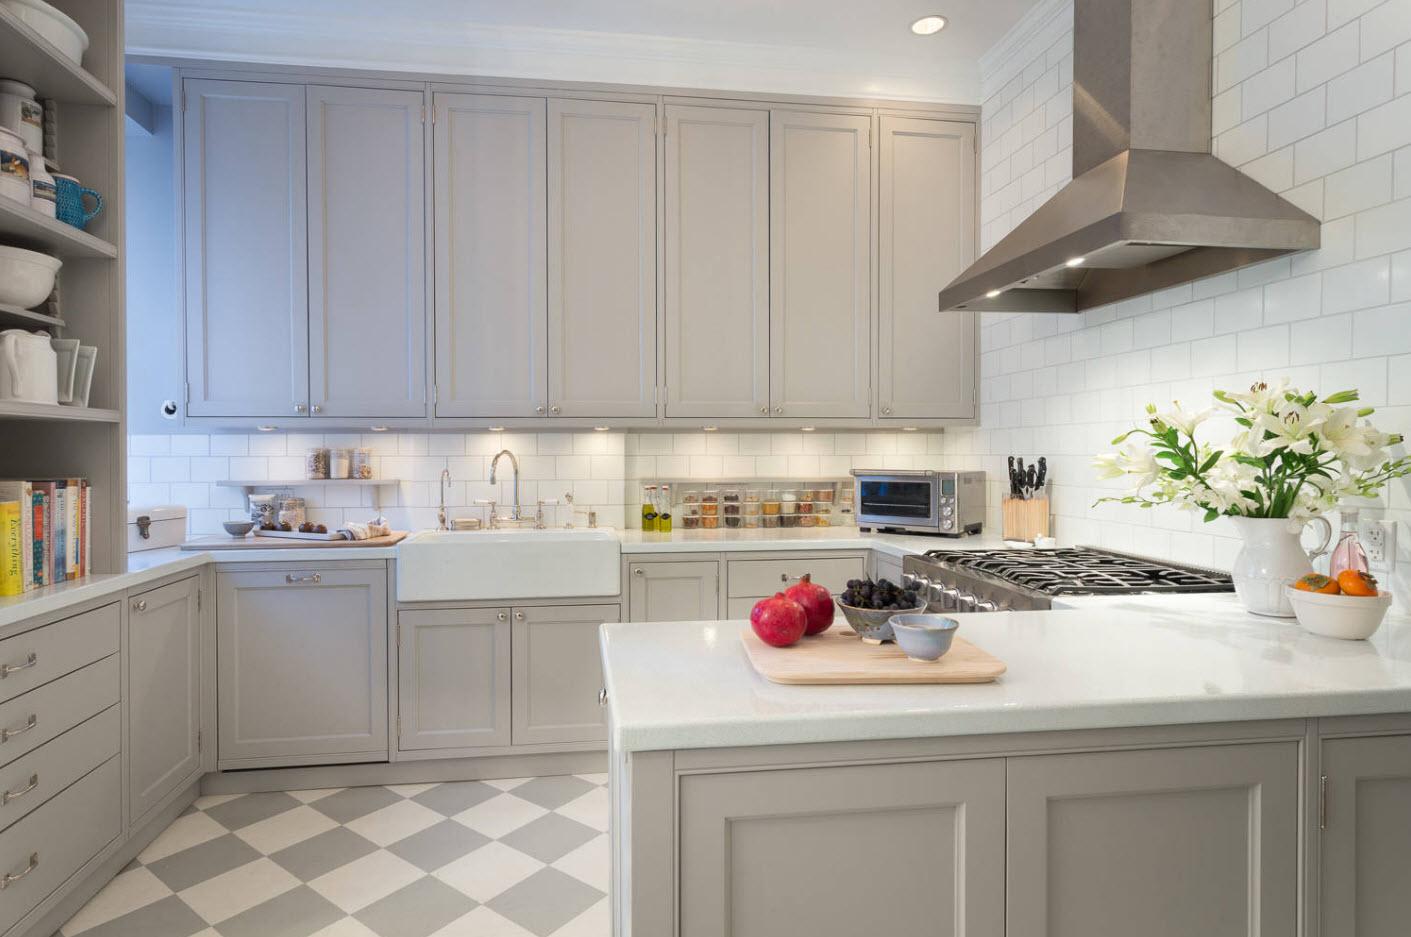 дизайн кухні сучасна класика